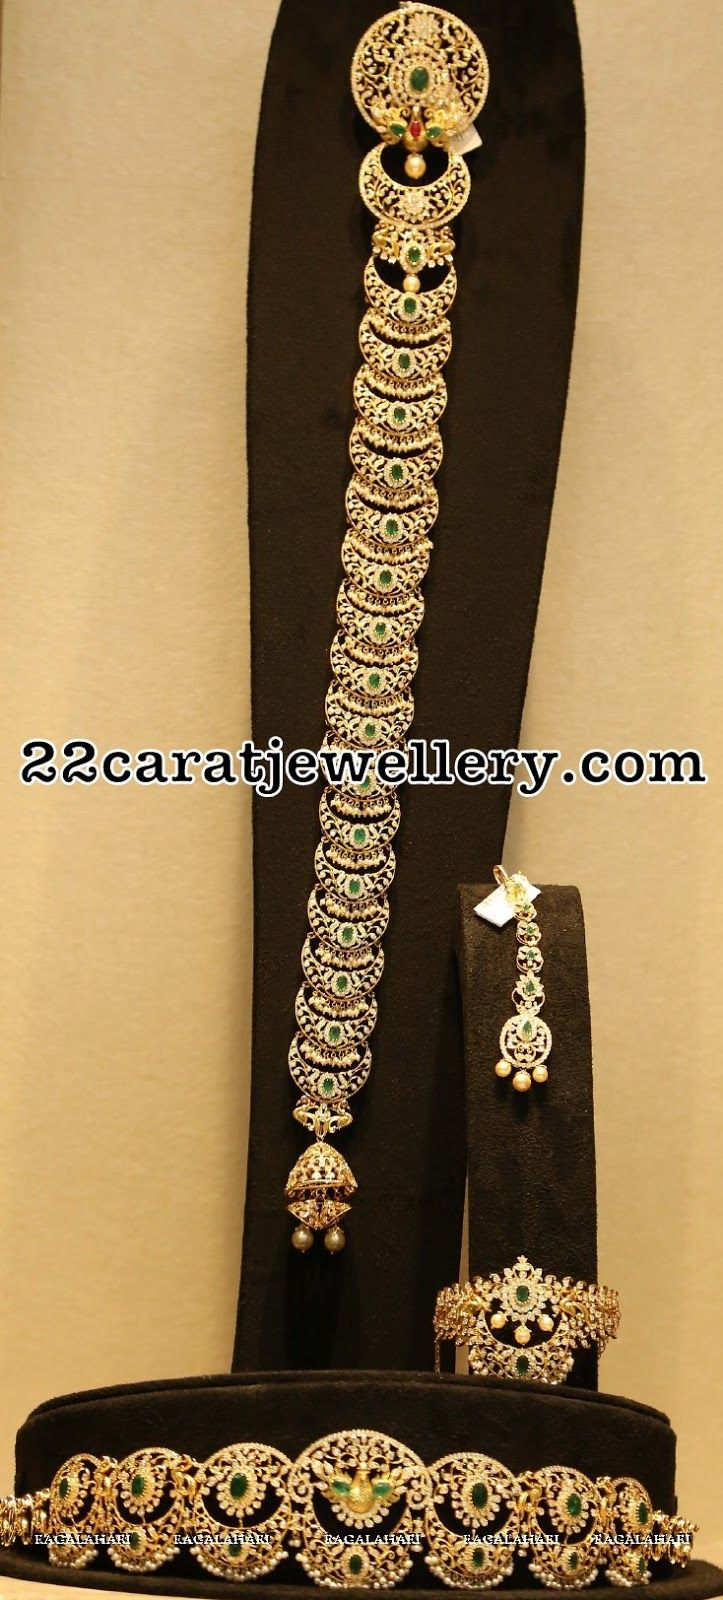 Pin by tejeswini m on pics pinterest jada indian jewelry and jewel